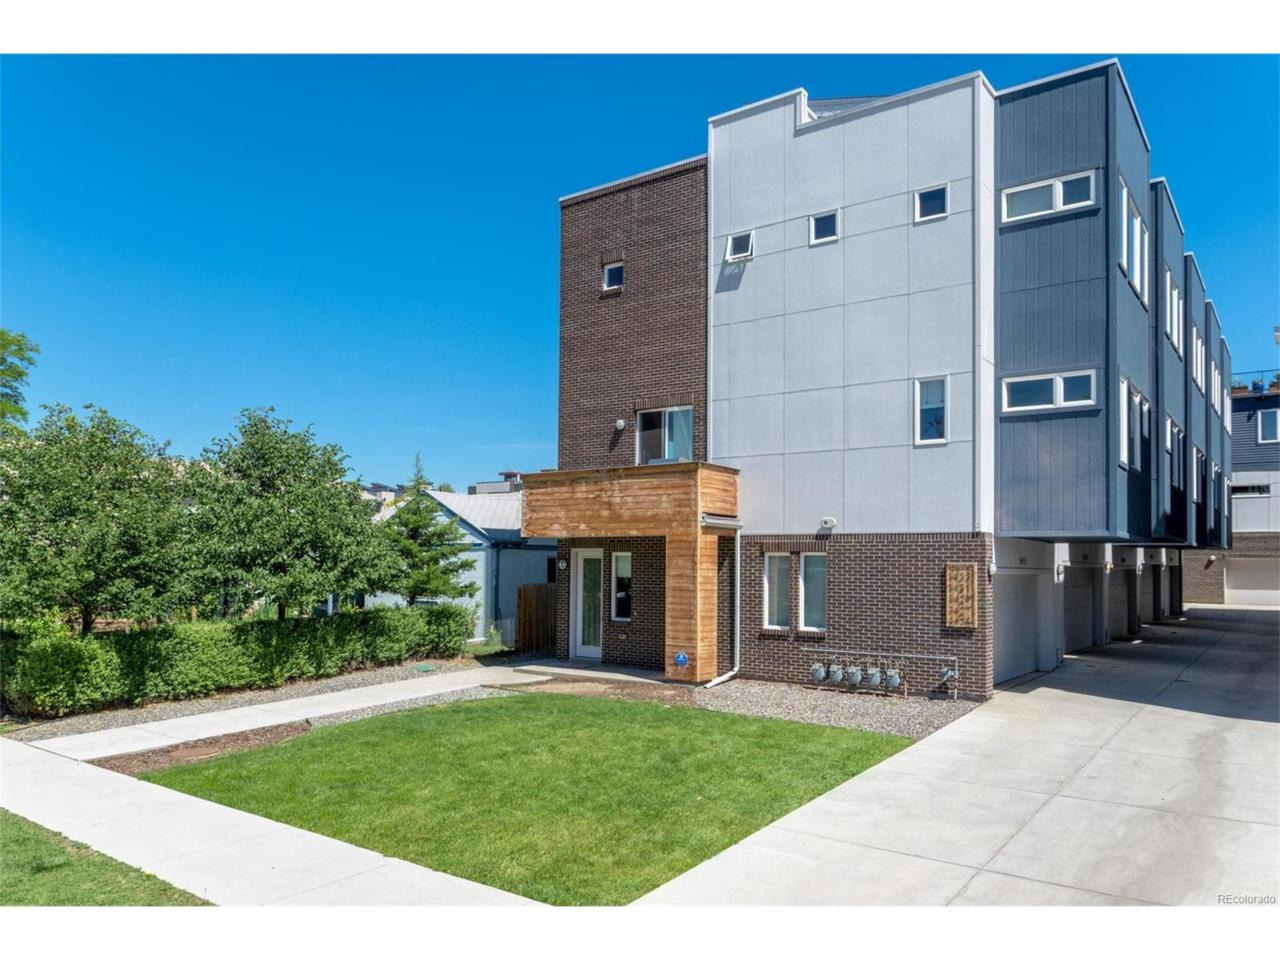 3433 W 16th Avenue, Denver, CO 80204 (MLS #6480522) :: 8z Real Estate